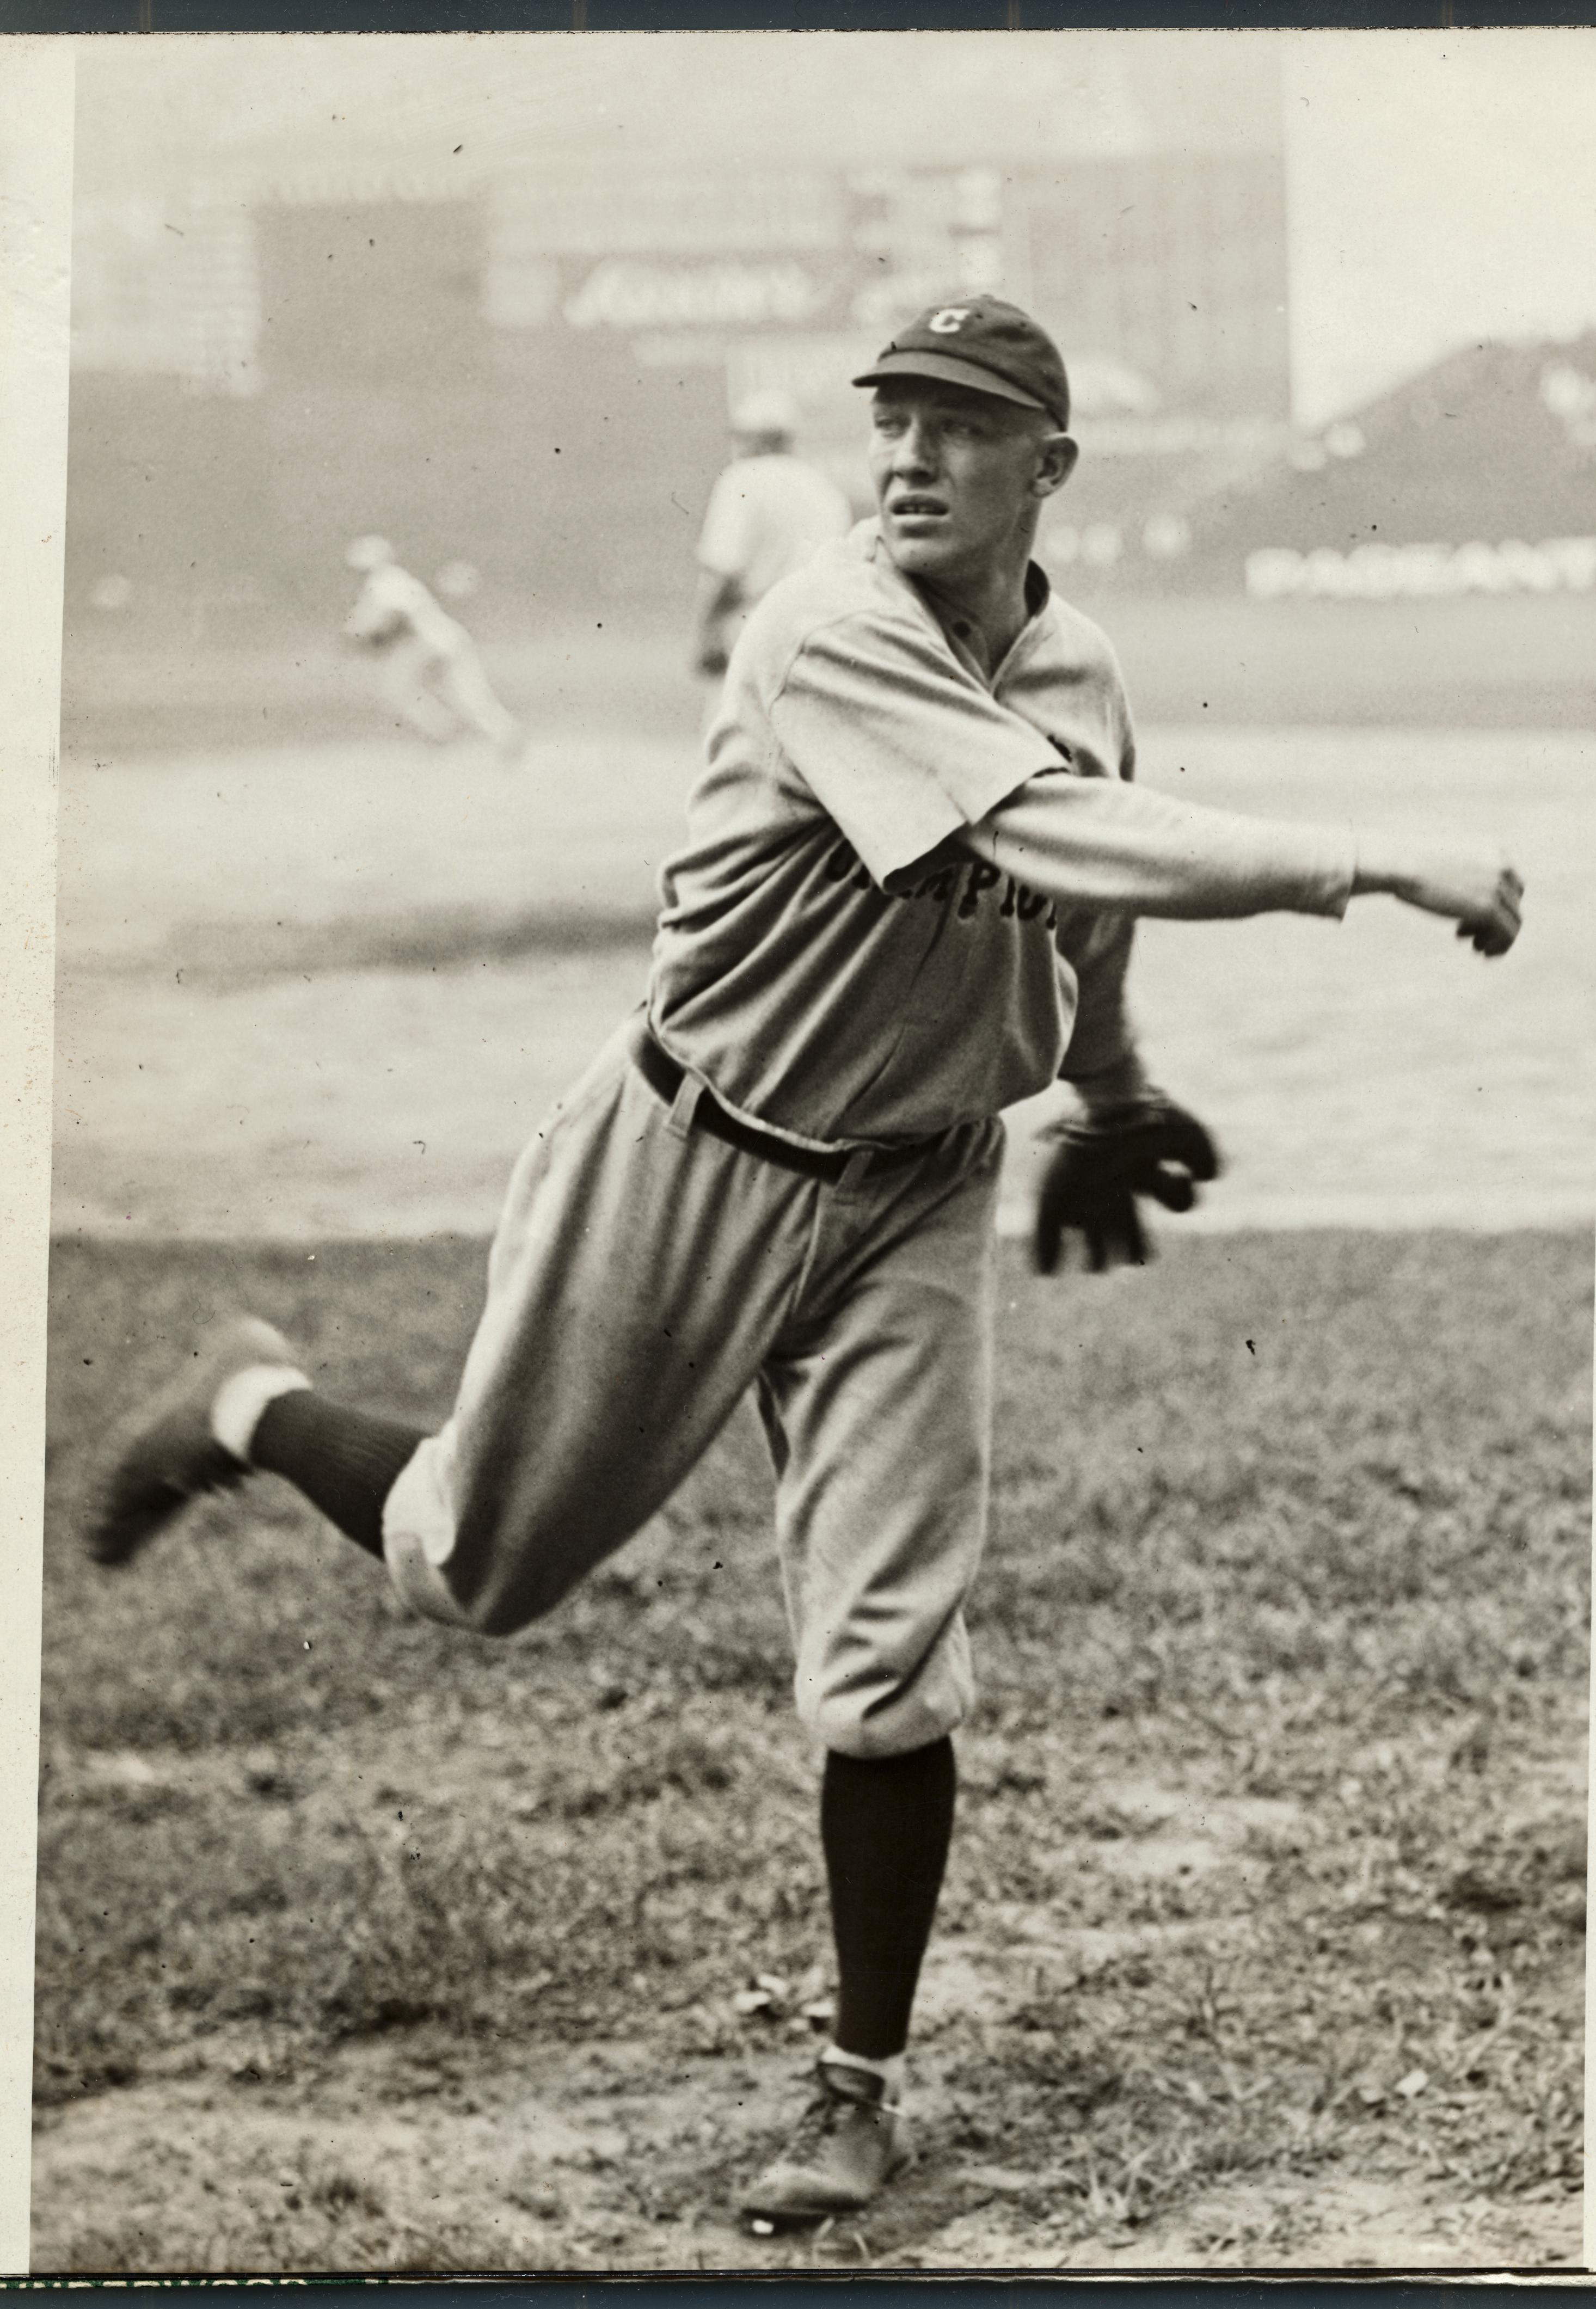 George Uhle on the Baseball Field